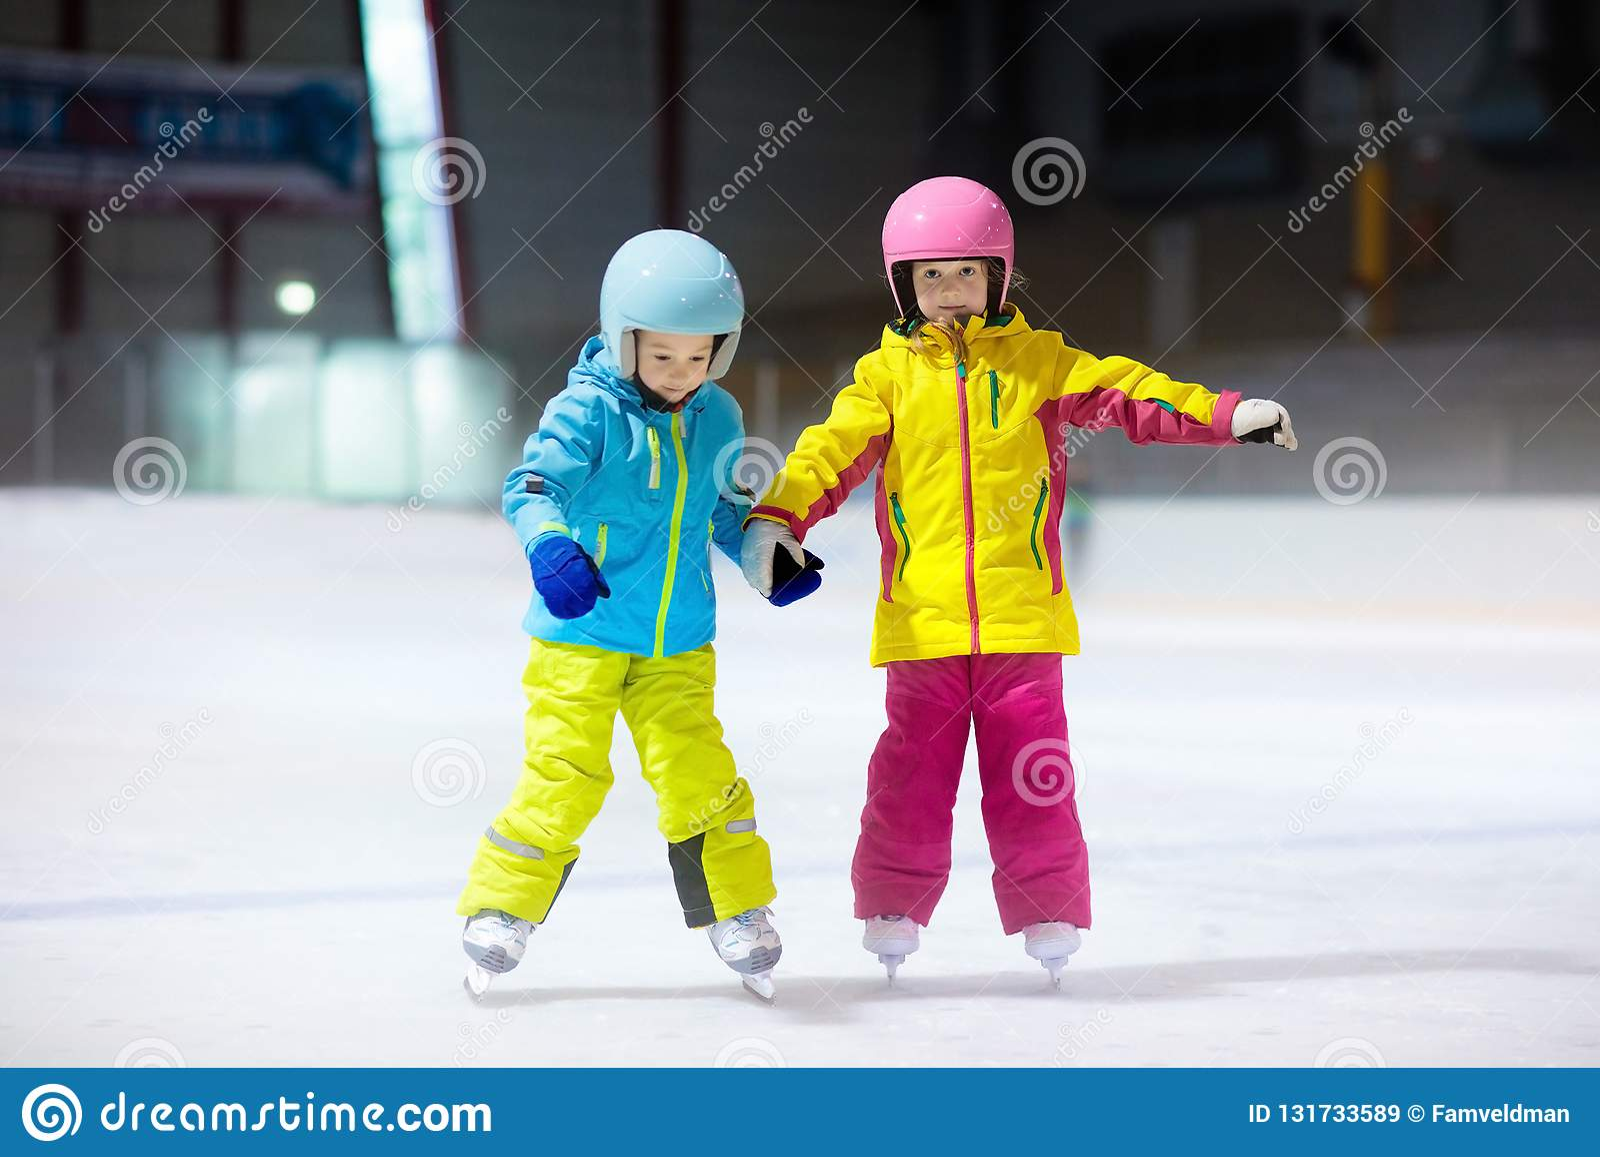 17 267 Ice Skates Photos Free Royalty Free Stock Photos From Dreamstime